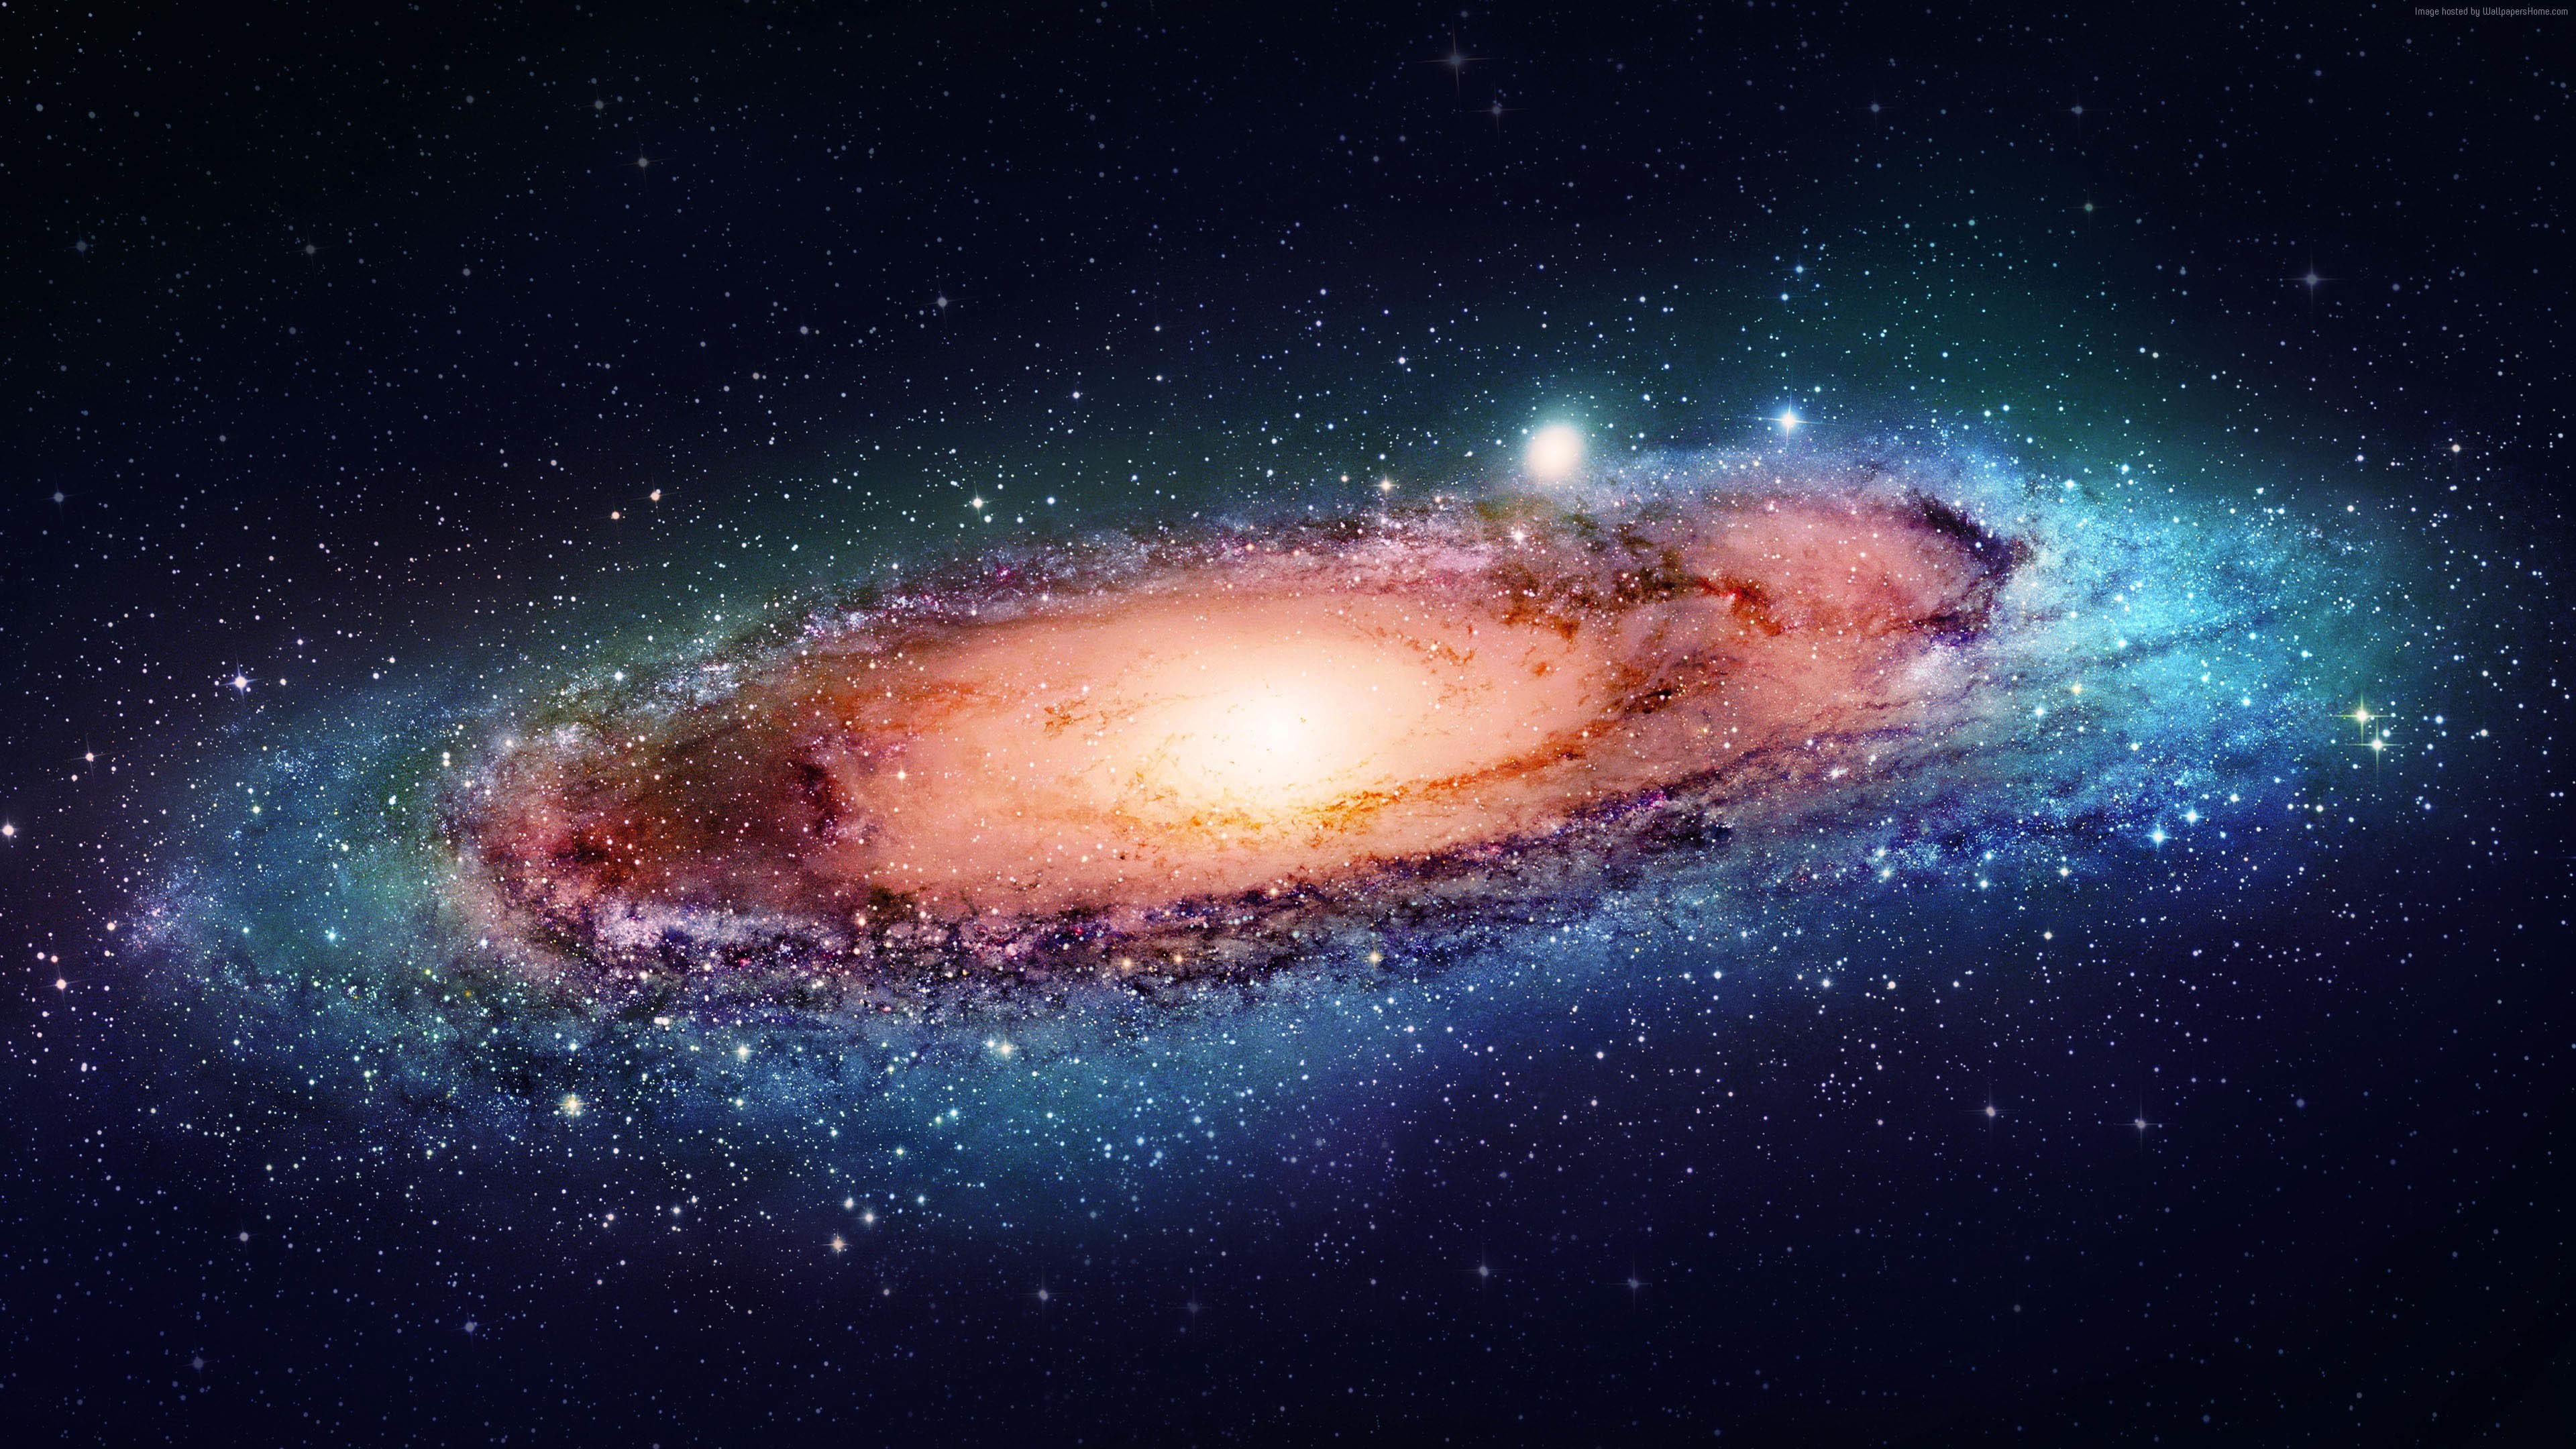 Galaxy Space Wallpaper wallpaper